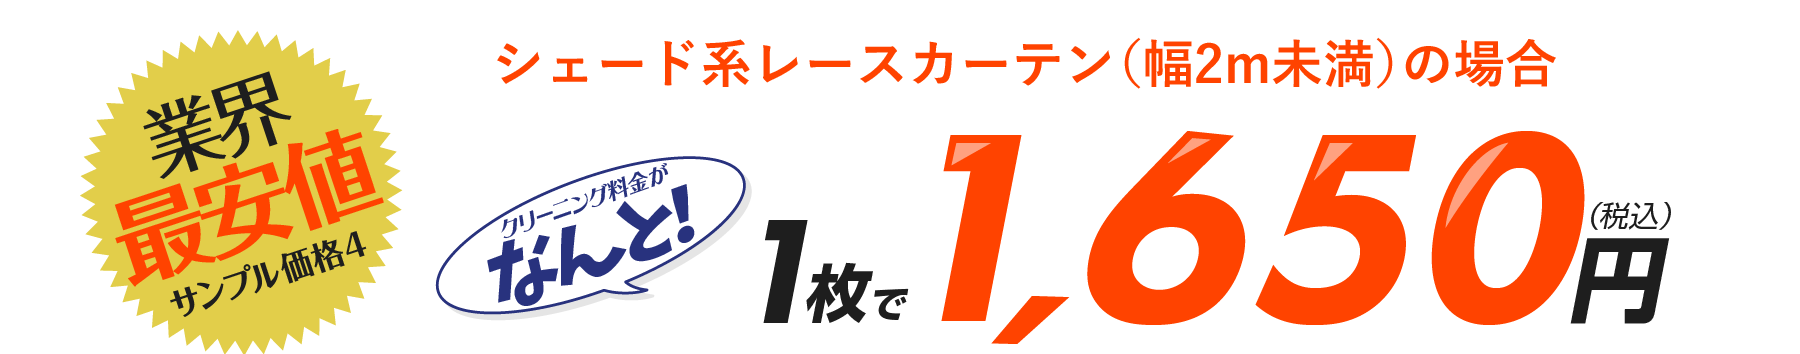 box3-image5